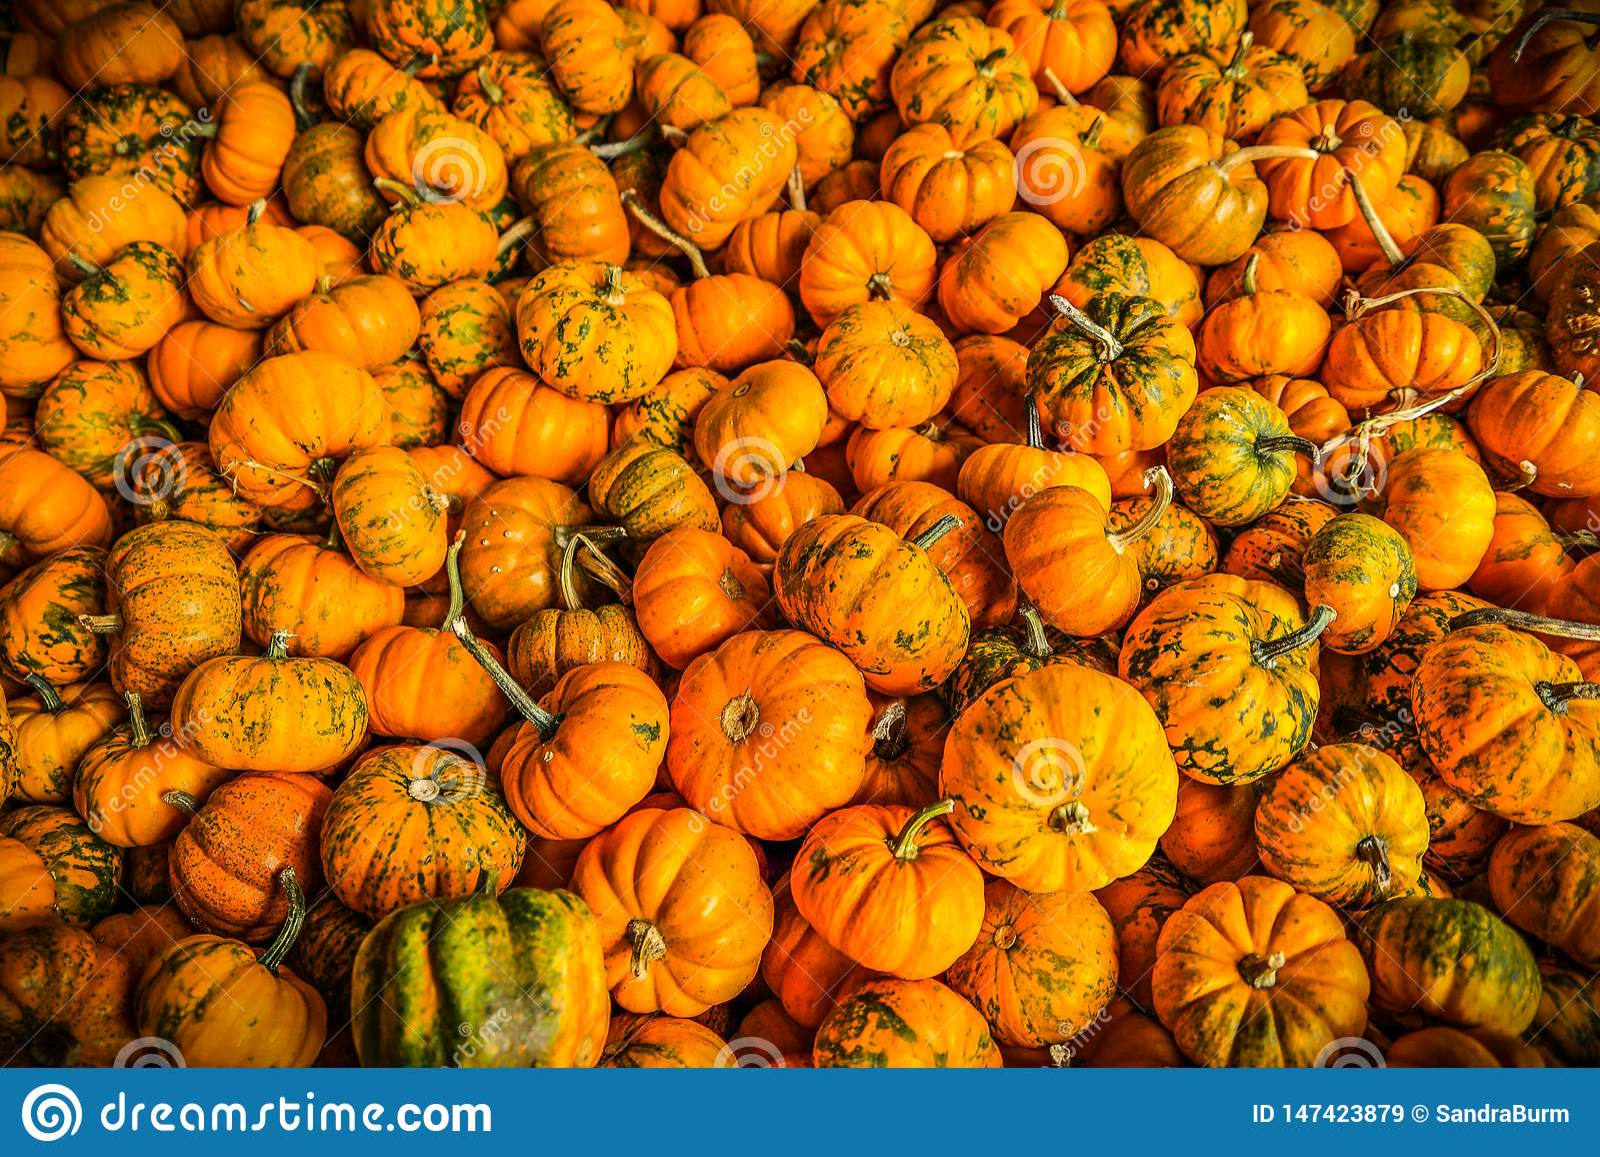 Mini pumpkins in autumn